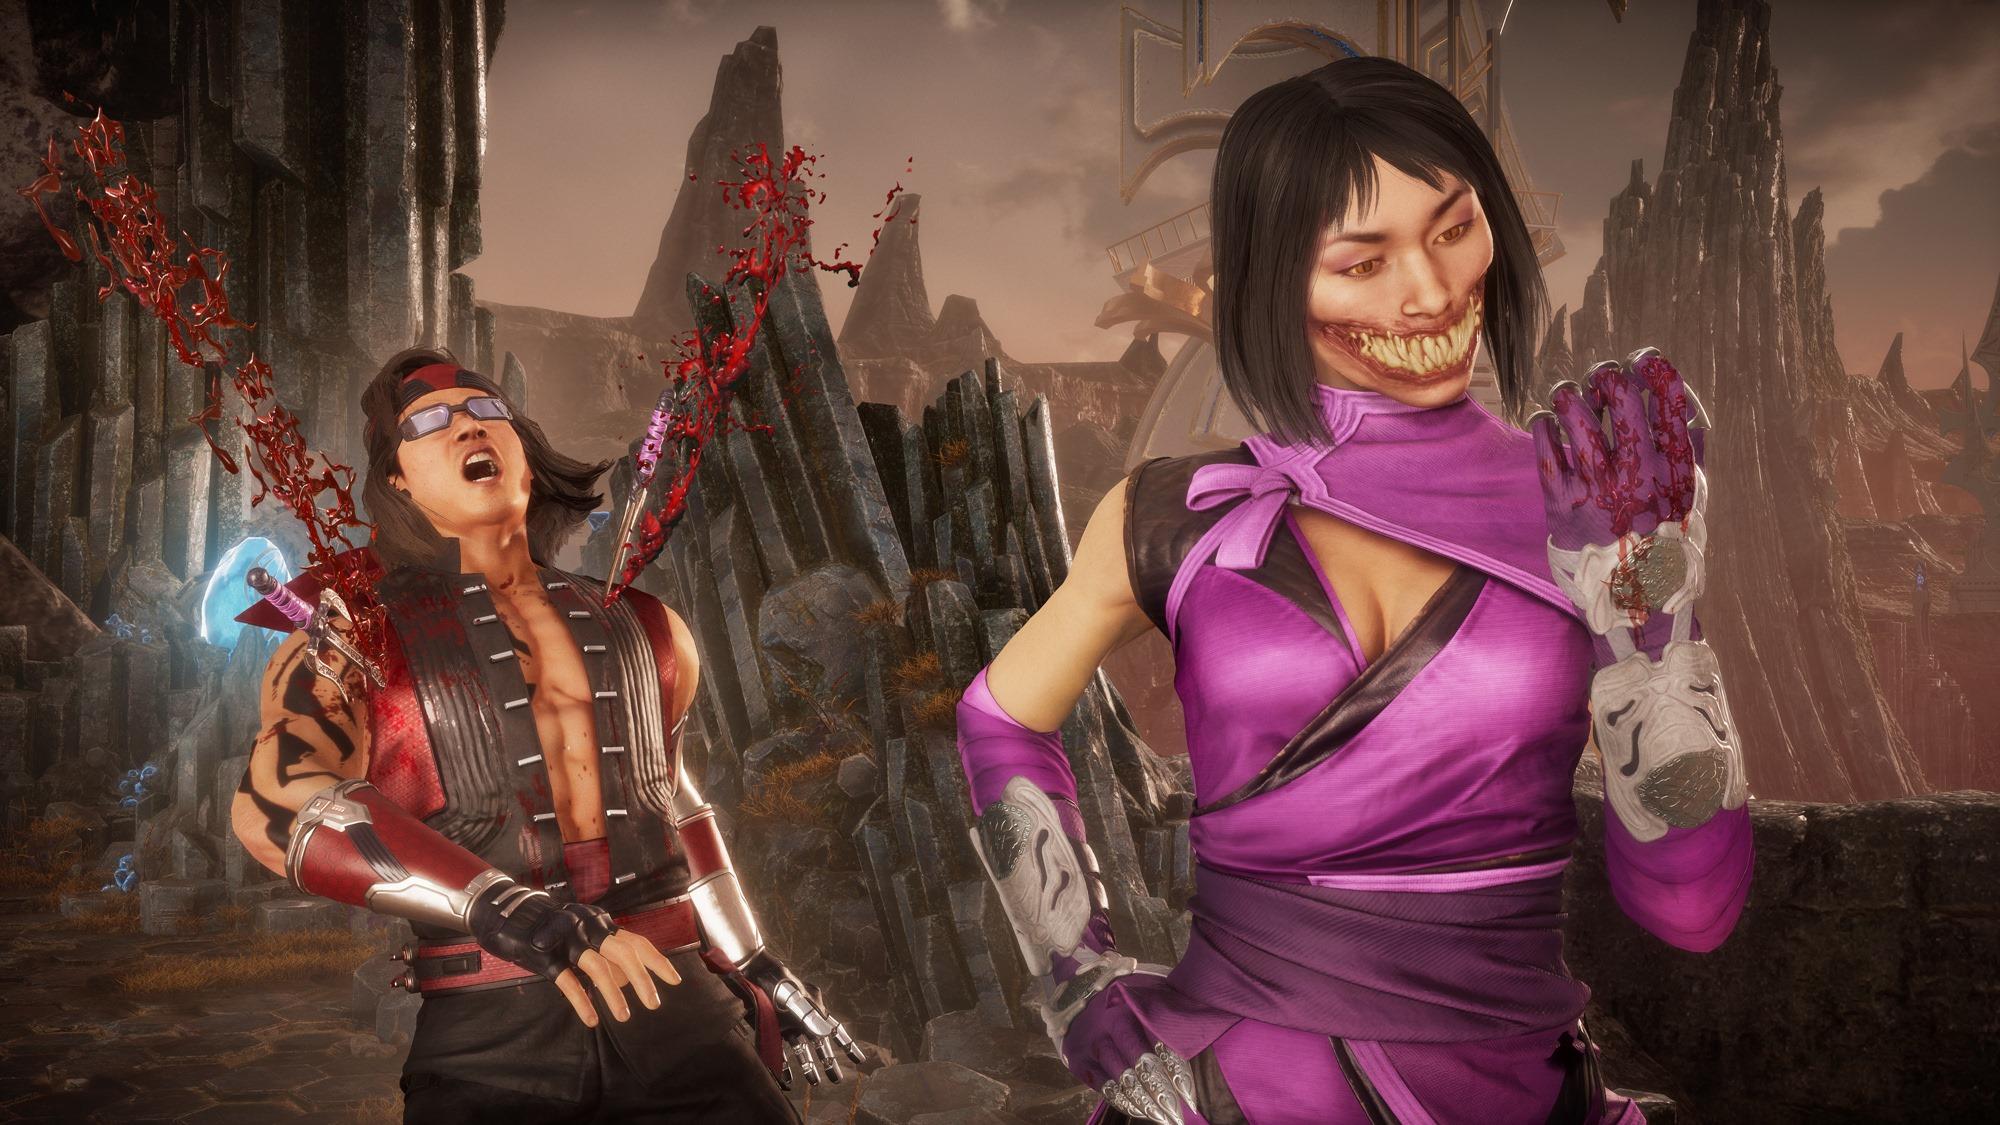 Mortal Kombat (Warner Bros. Games)